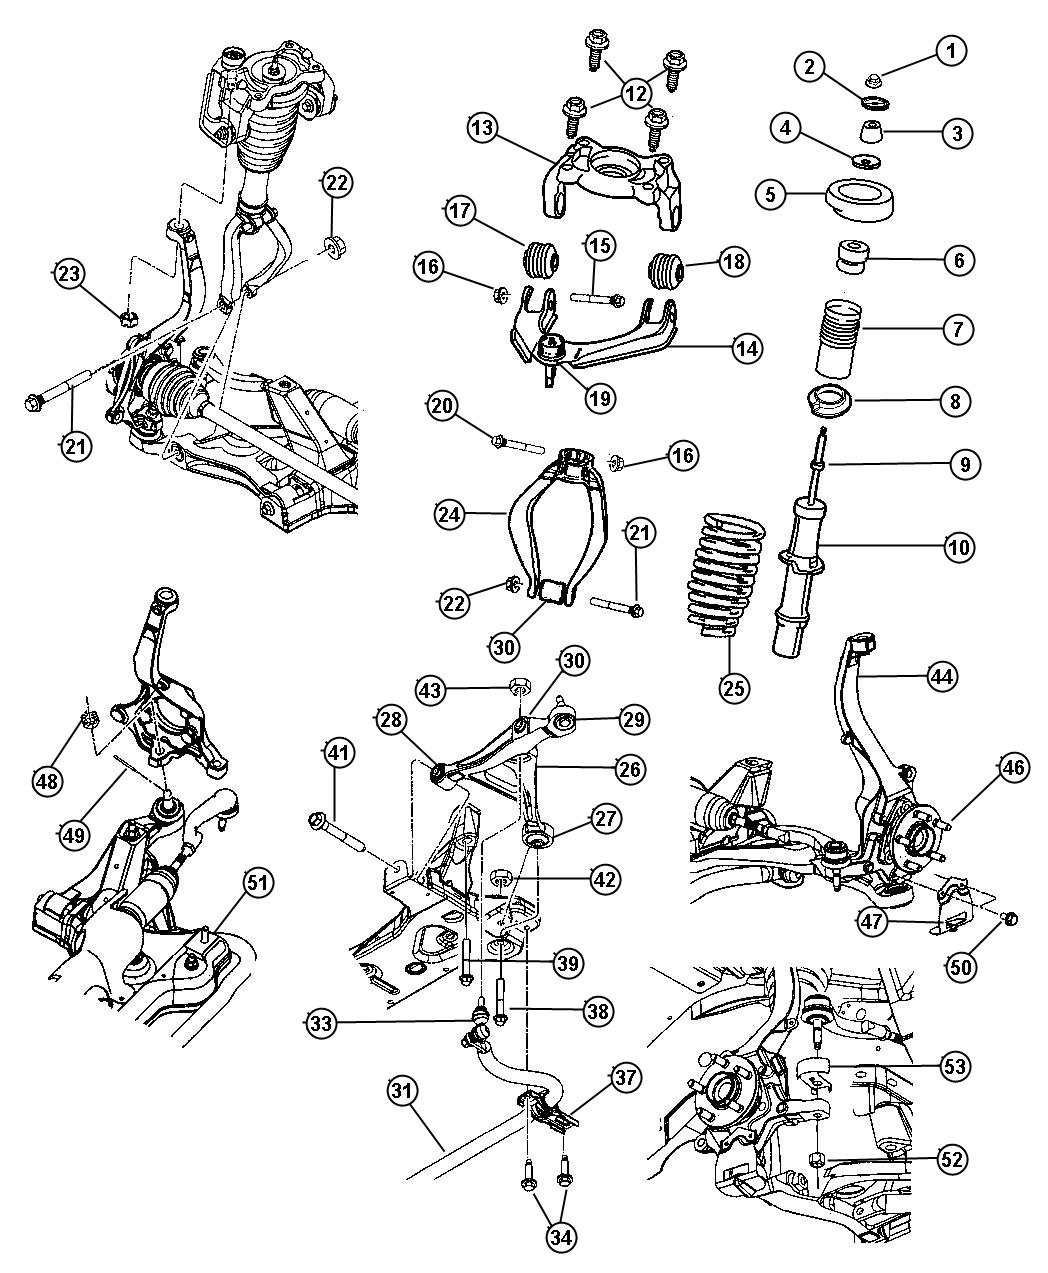 1969 camaro factory tach wiring diagram